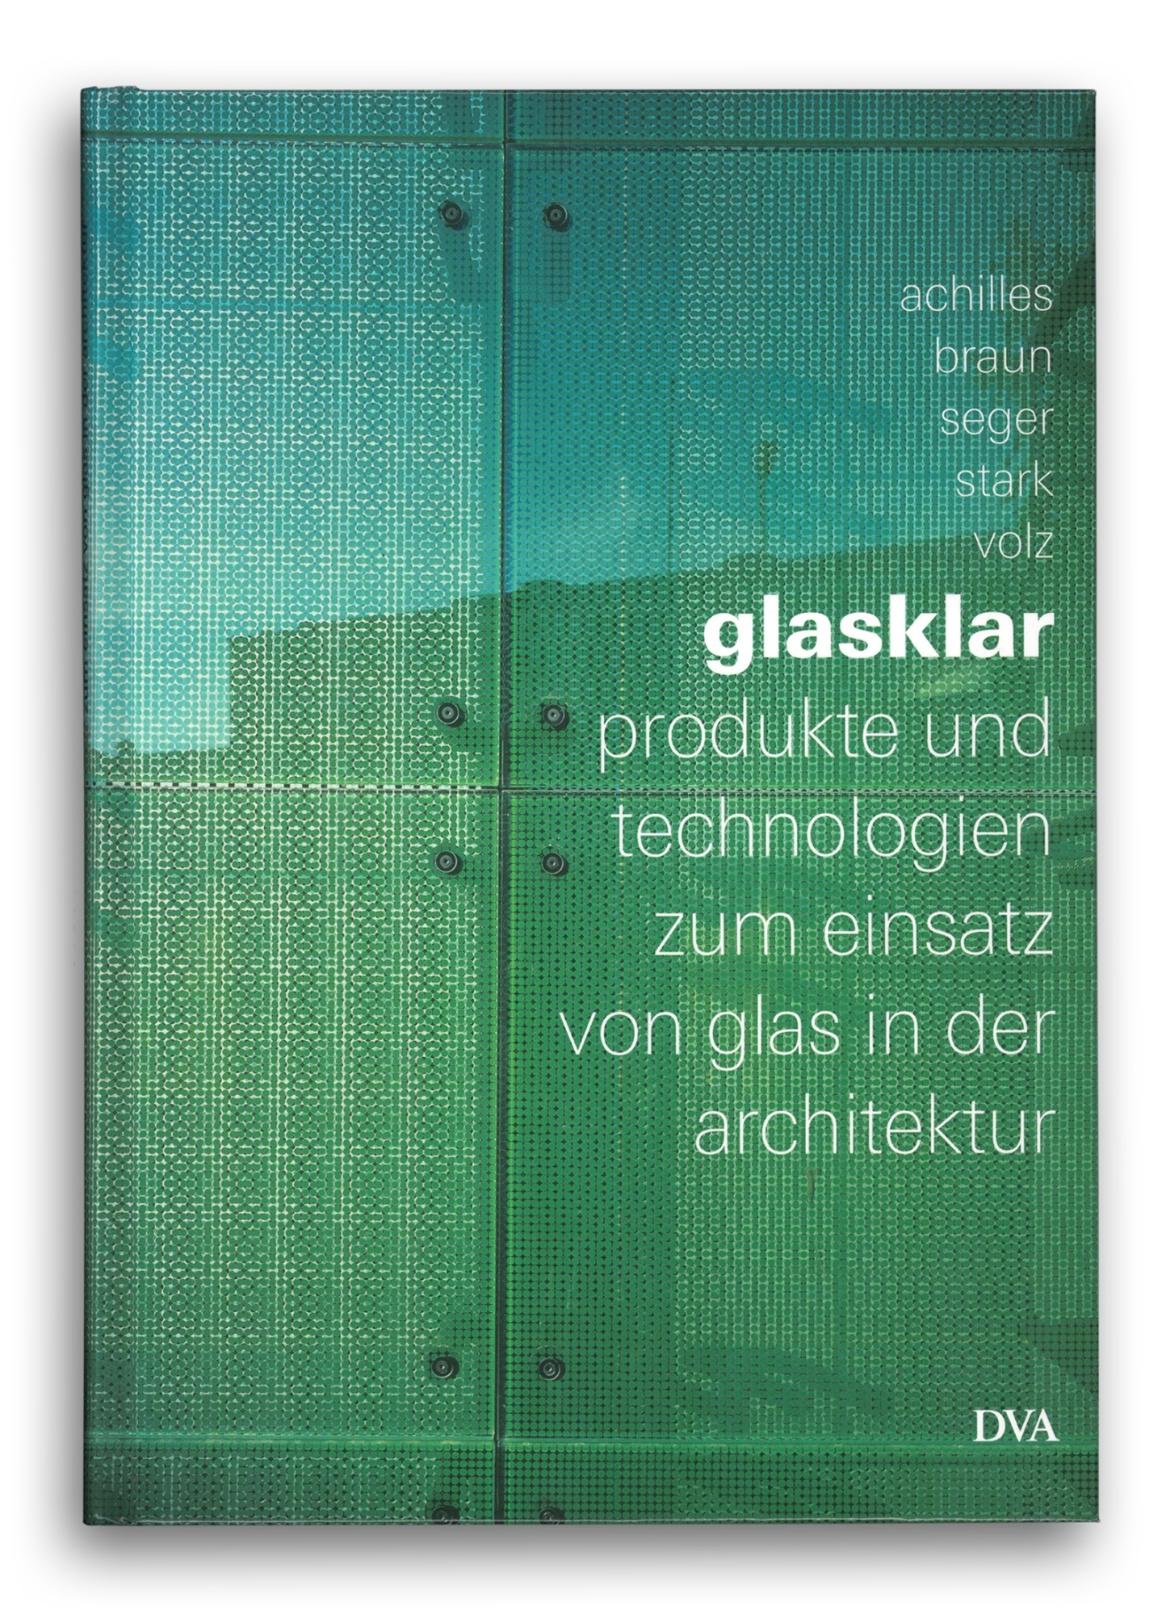 Buchcover: glasklar